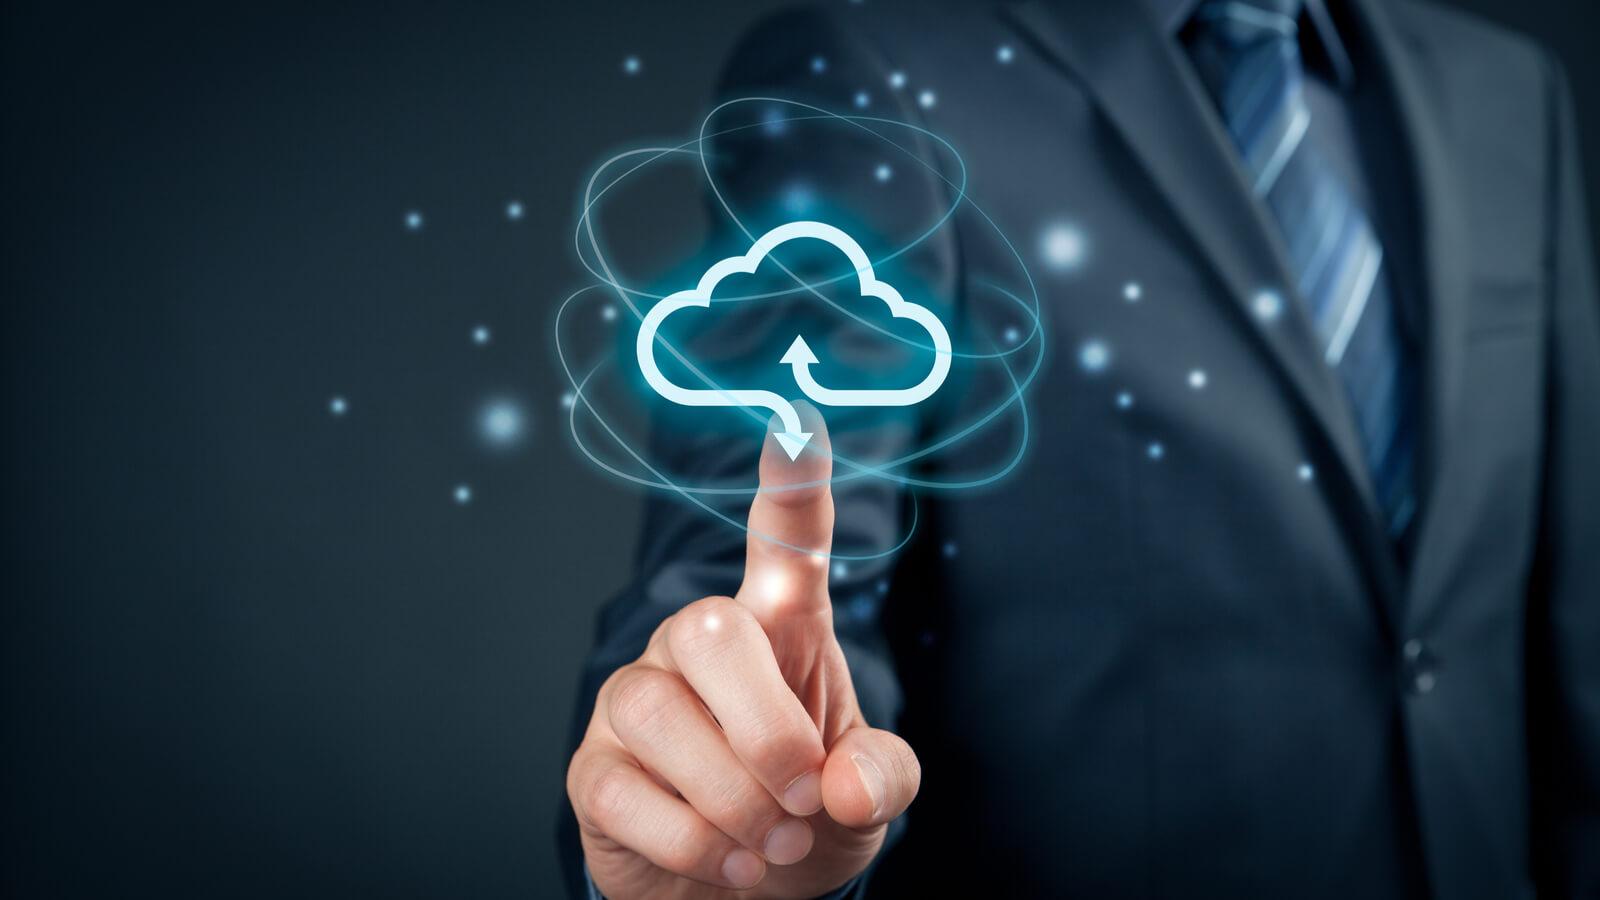 Cloud Migration Services - Global Market Outlook (2017-2026)